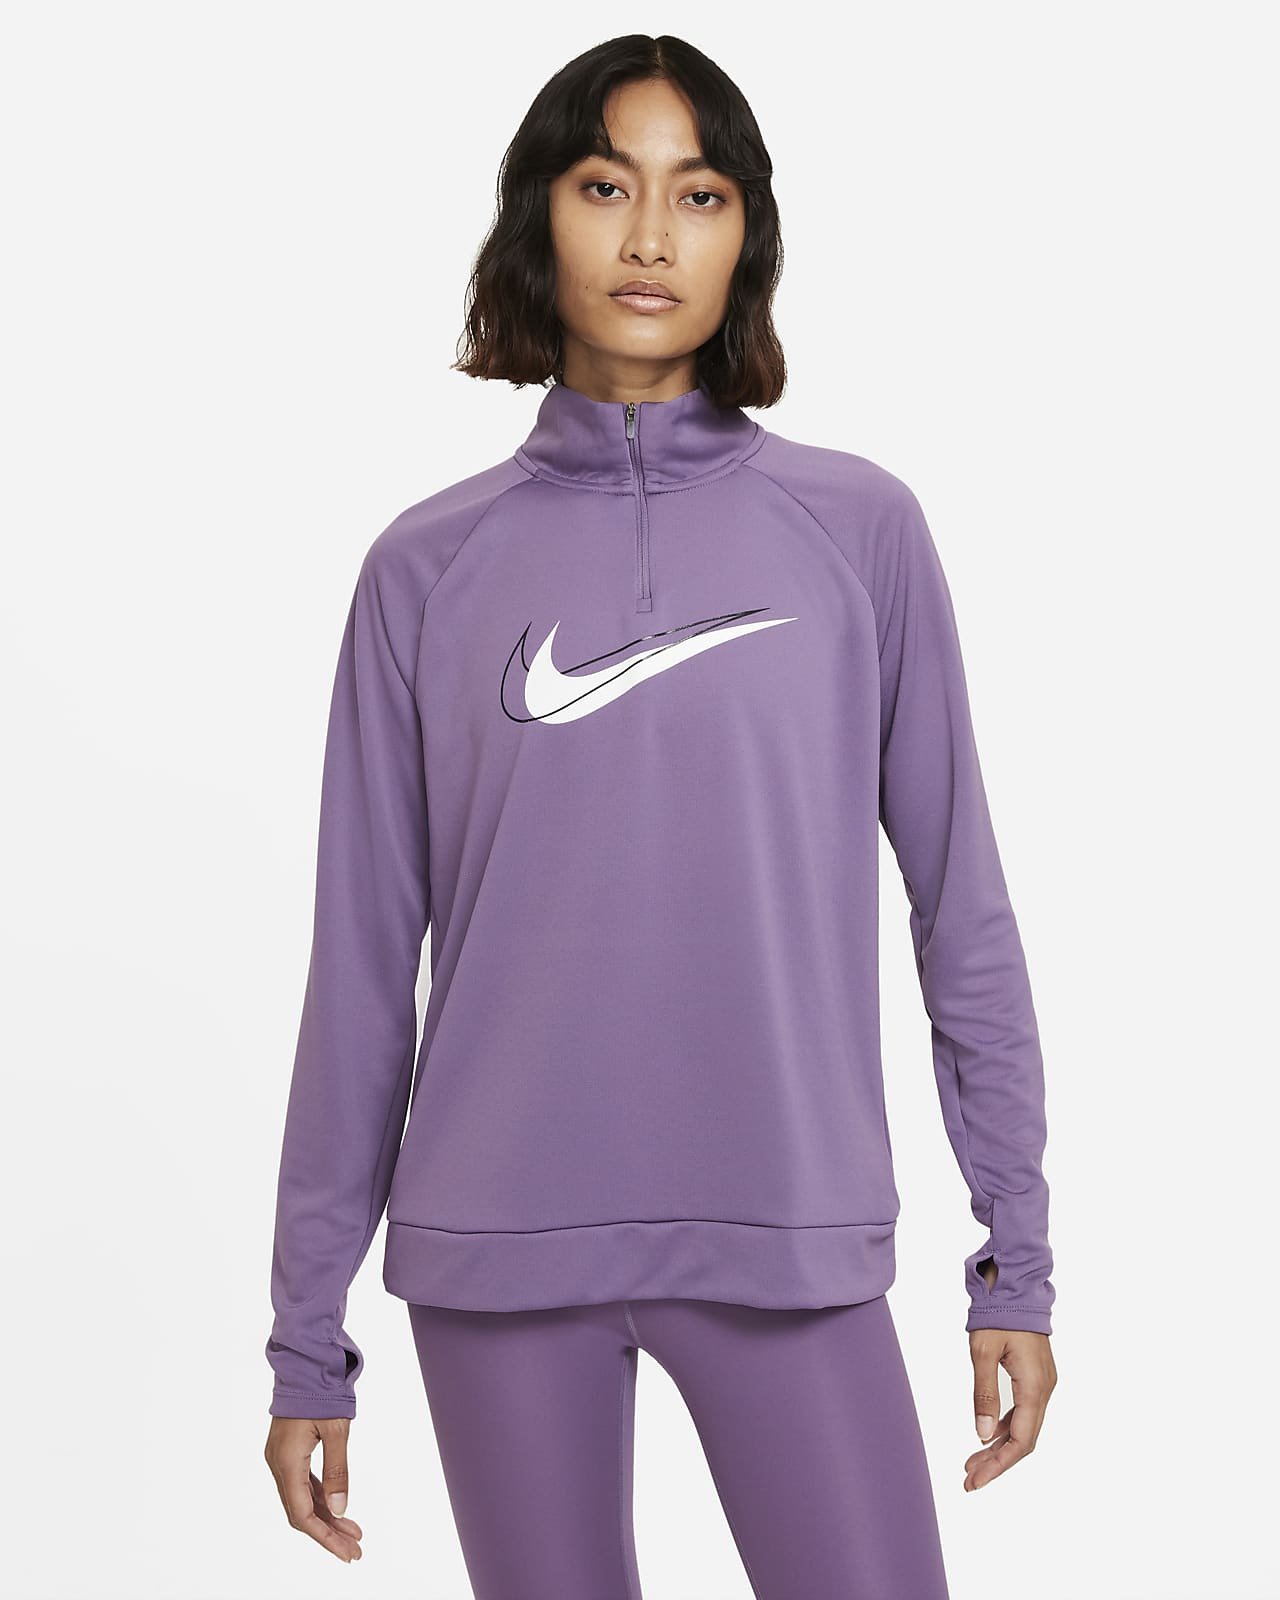 Nike Dri-FIT Swoosh Run Camiseta de capa media de running con media cremallera - Mujer